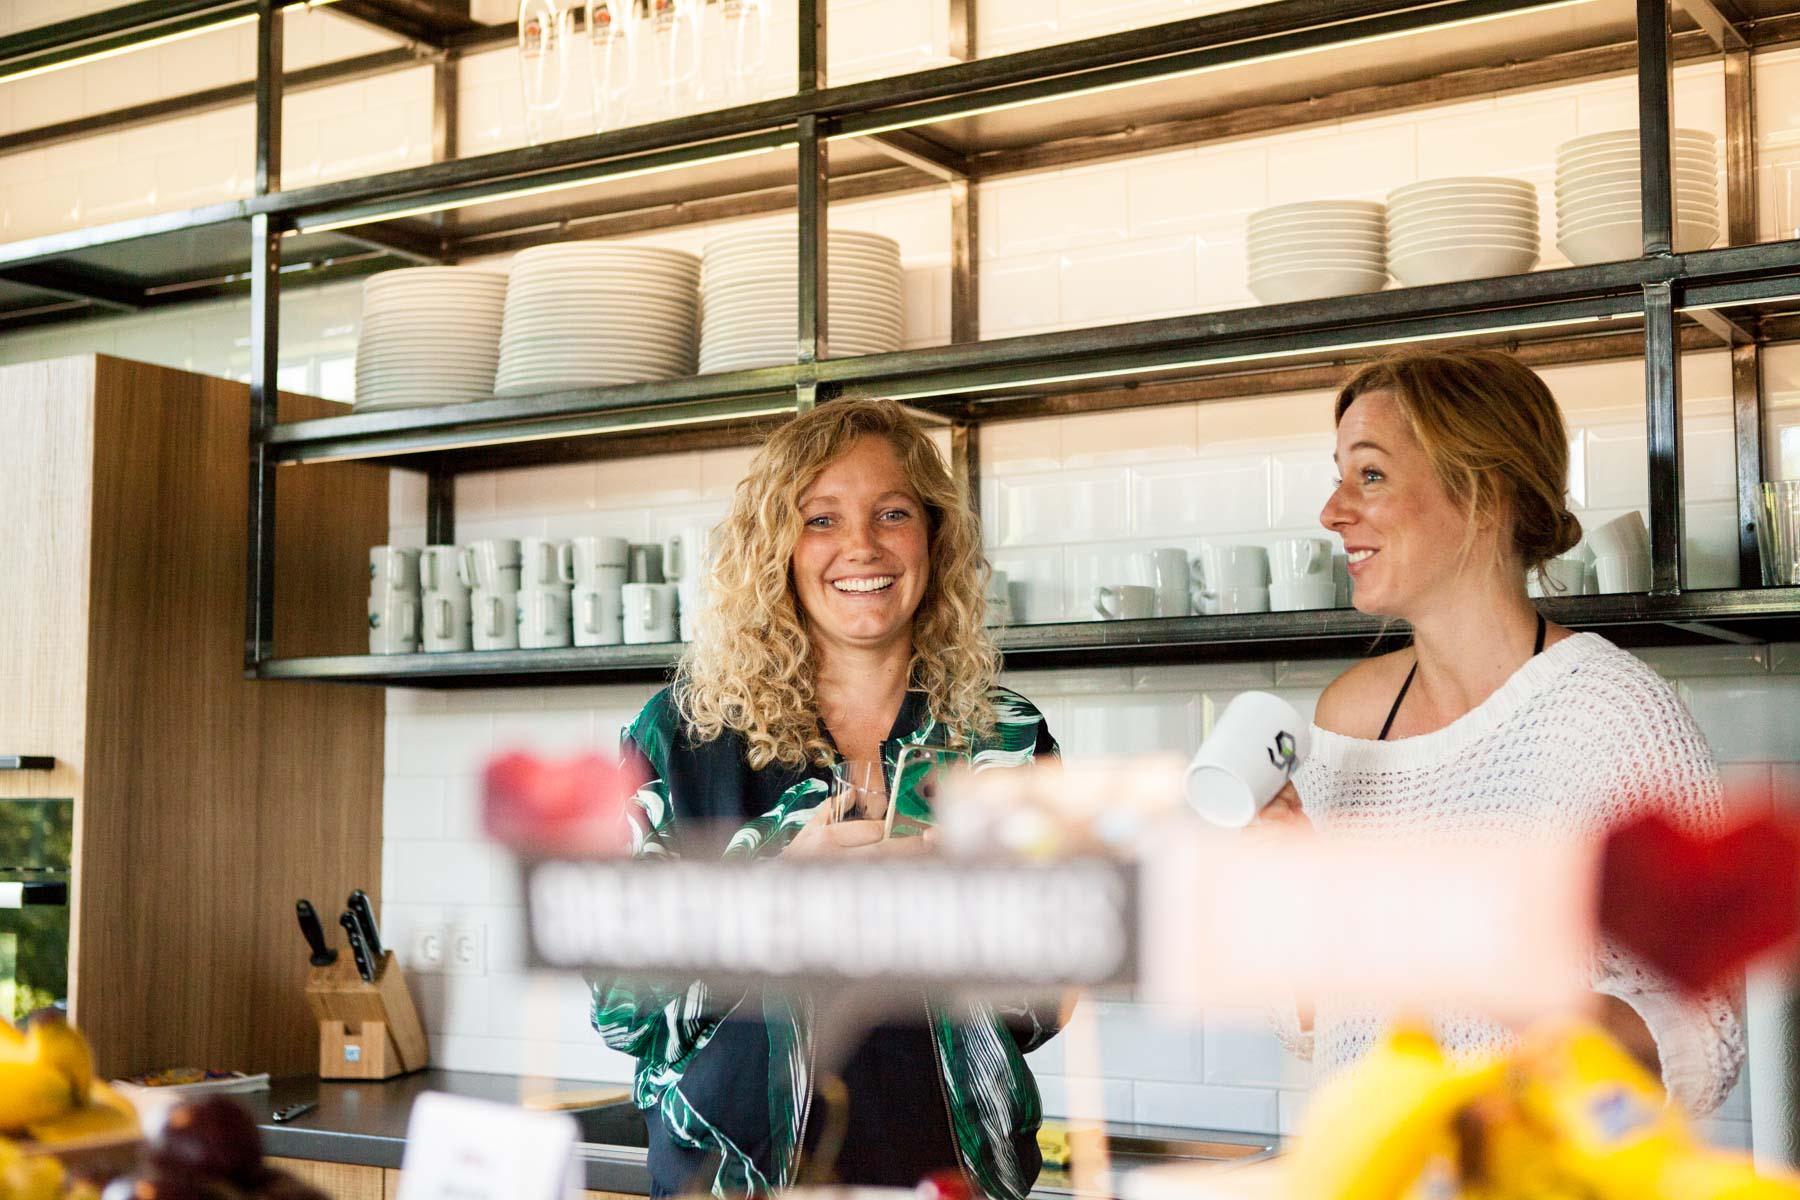 creative mornings köln vortrag frühstück grandceantrix Michaela Berghaus Veronica Garcia unterhaltung gespräch croissant jörn strojny